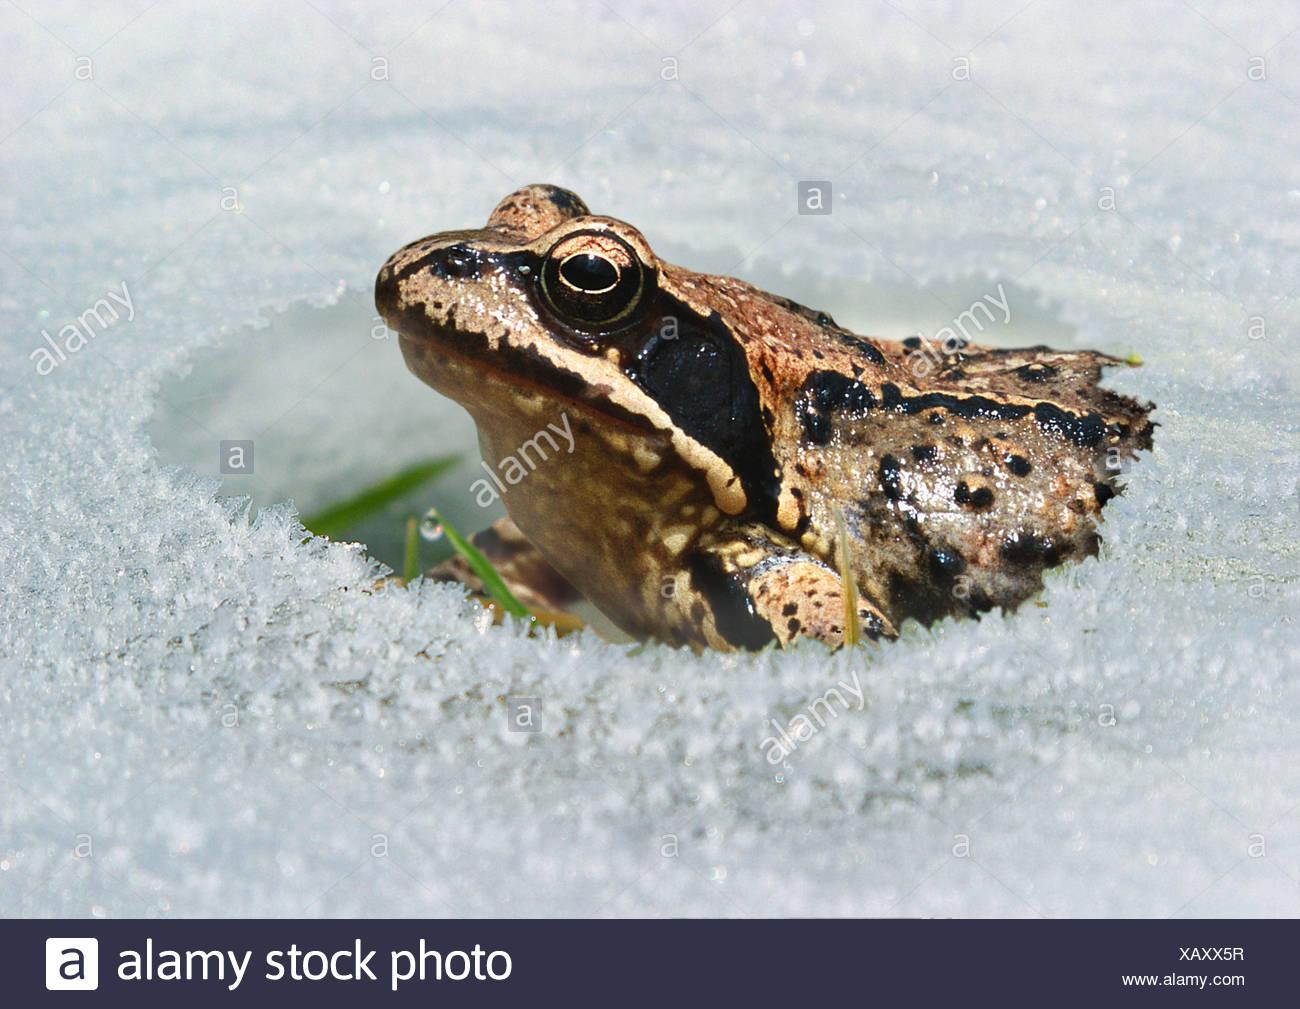 common frog, grass frog (Rana temporaria), sitting in snow, Germany, Bavaria, Erding - Stock Image